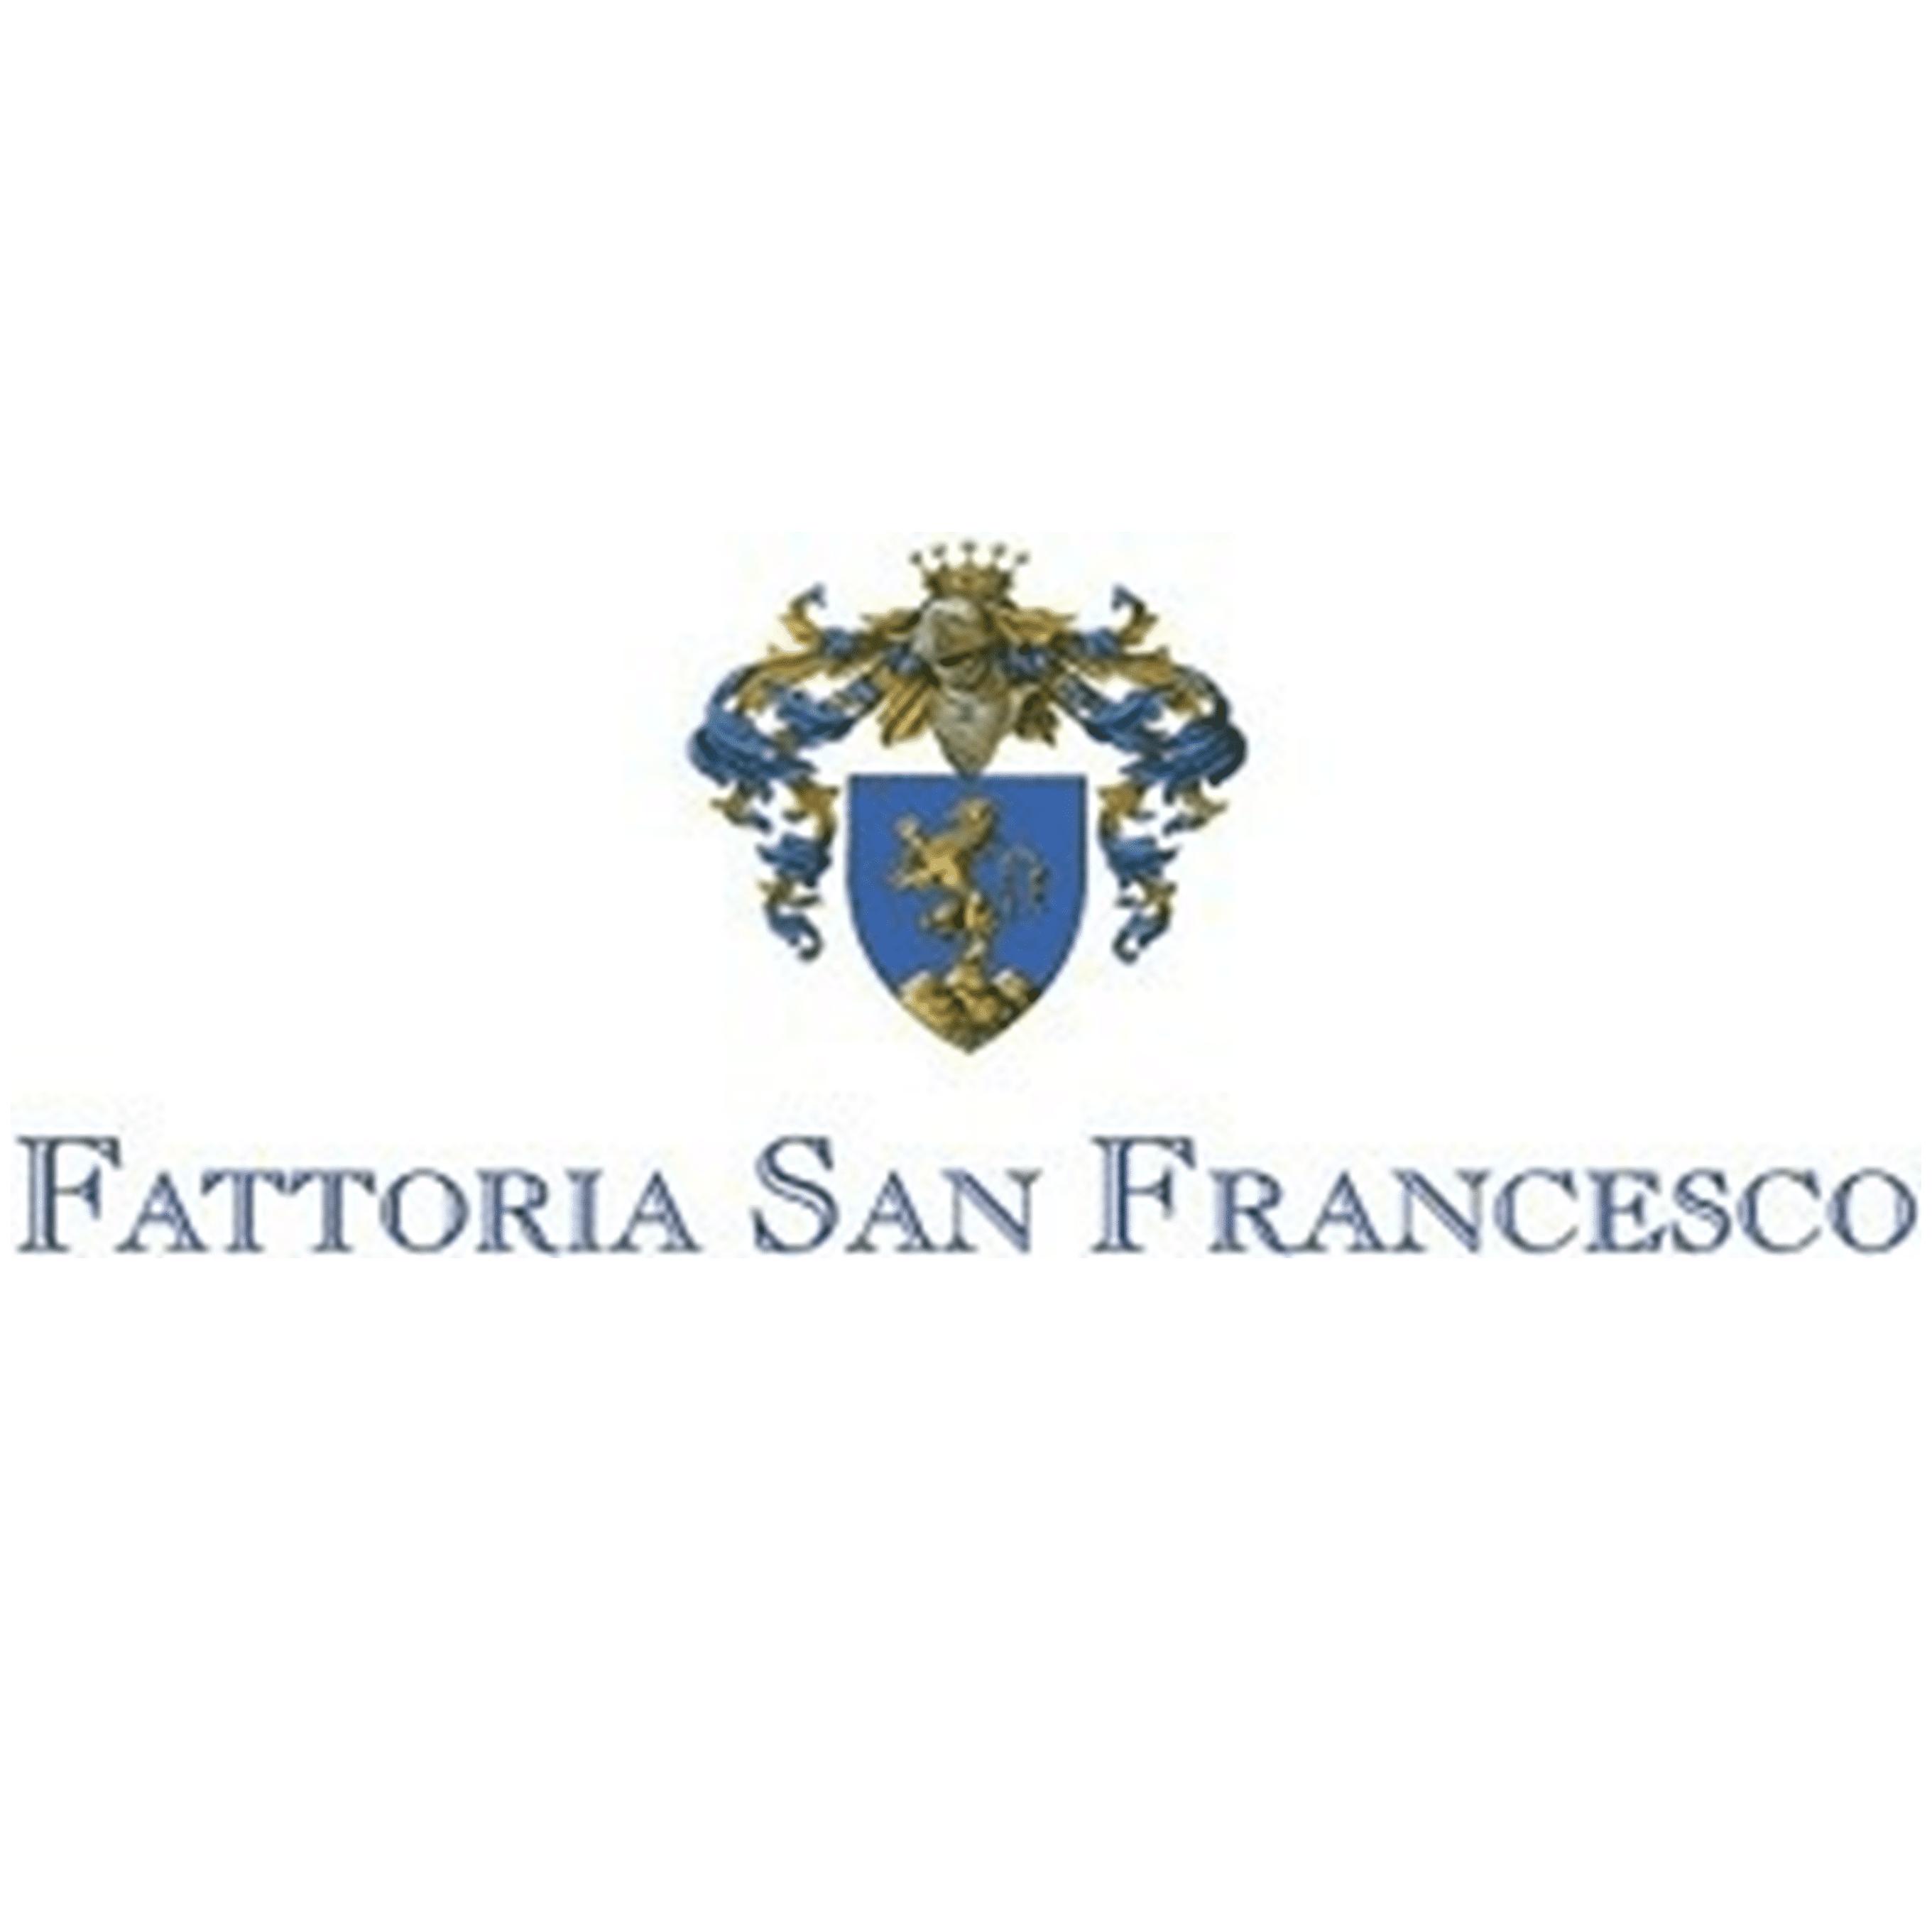 fattoria-san-francesco